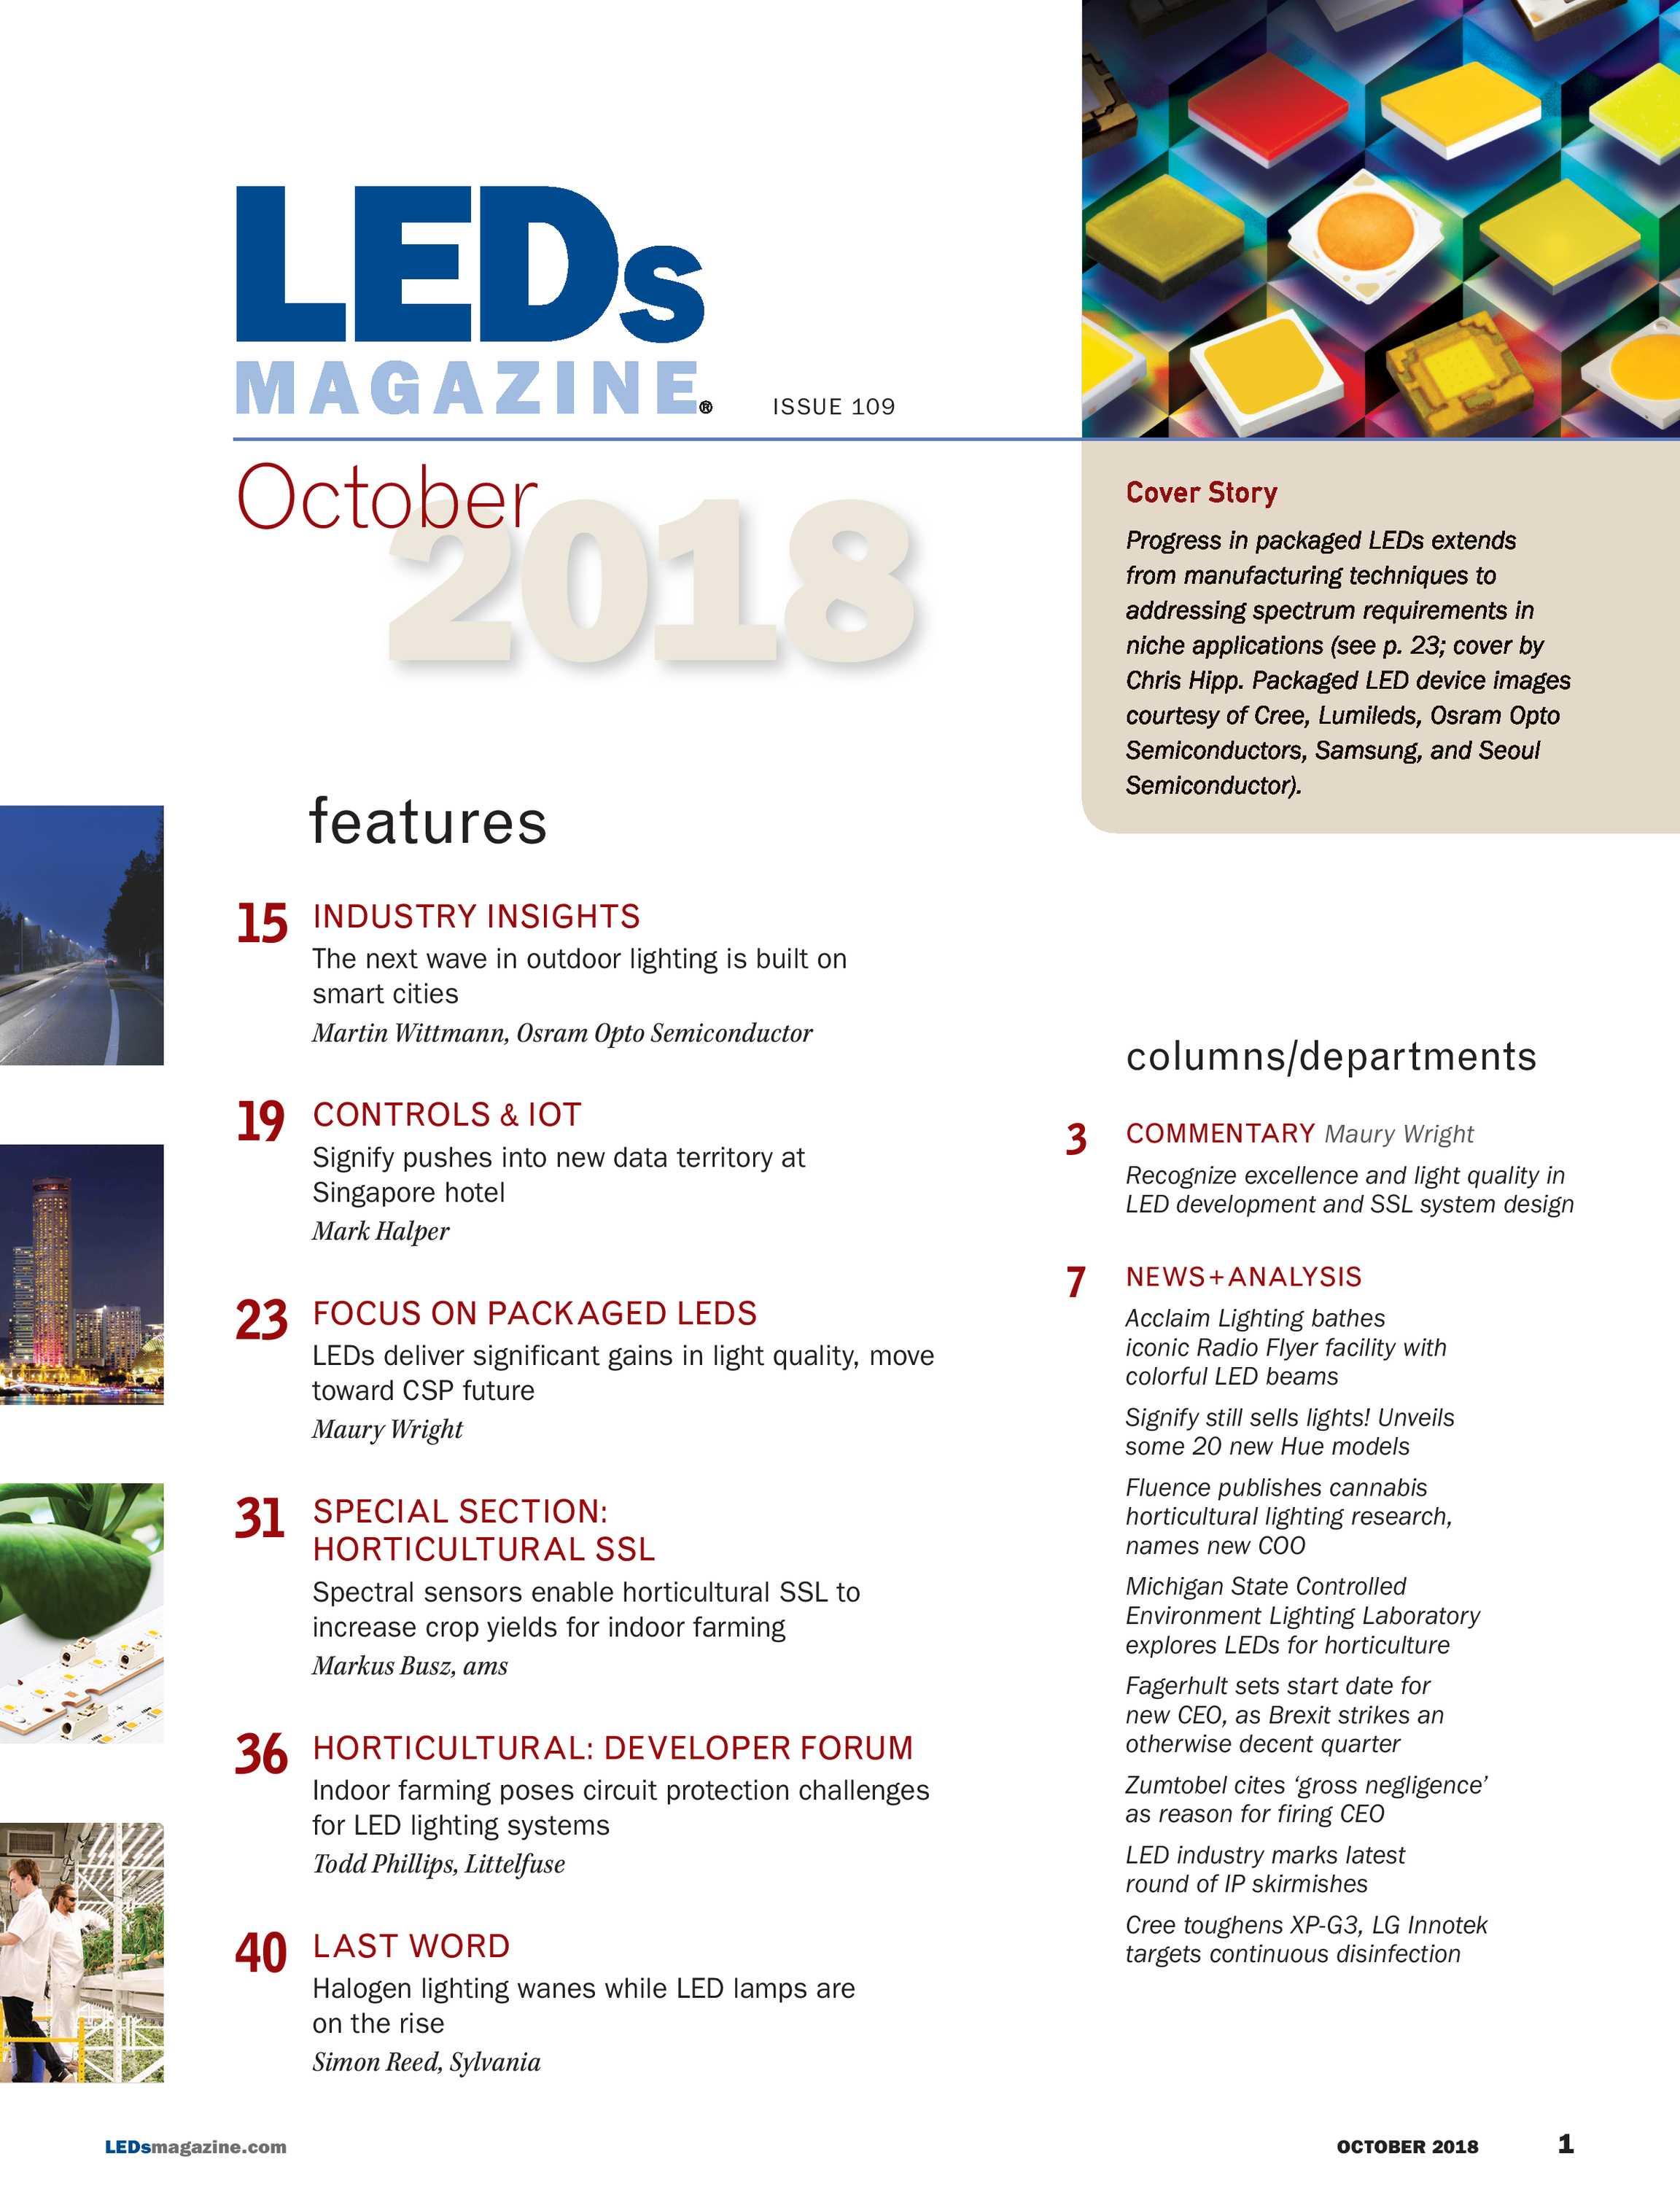 Leds Magazine October 2018 Page 1 Led Light System Circuit